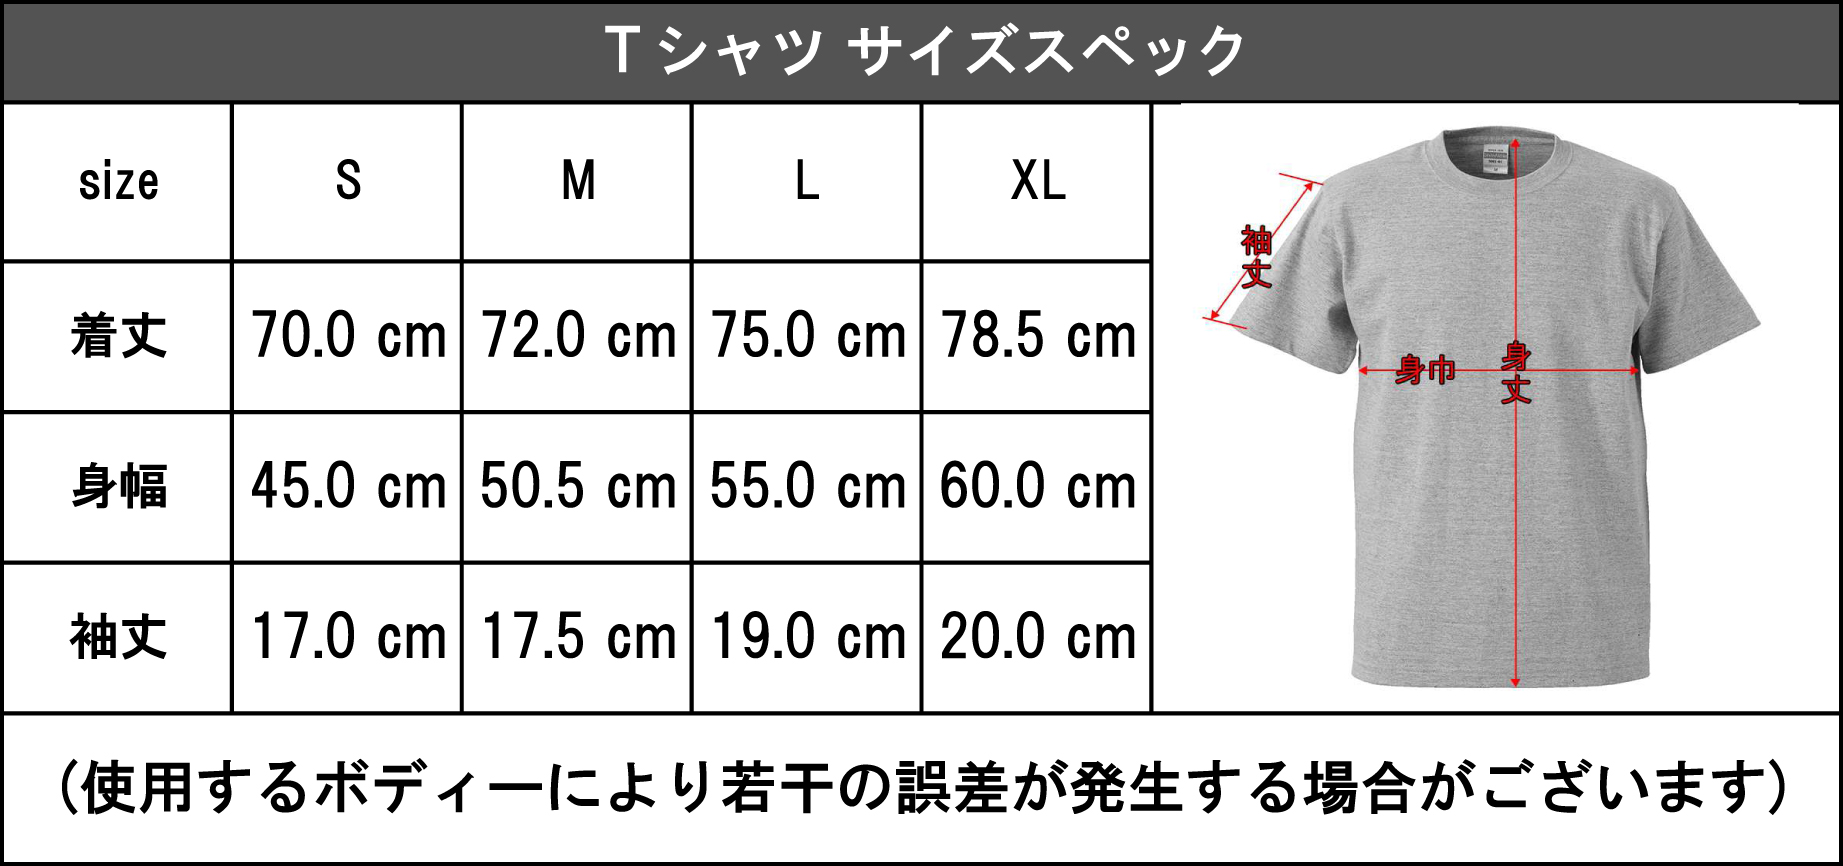 Tシャツ サイズスペック